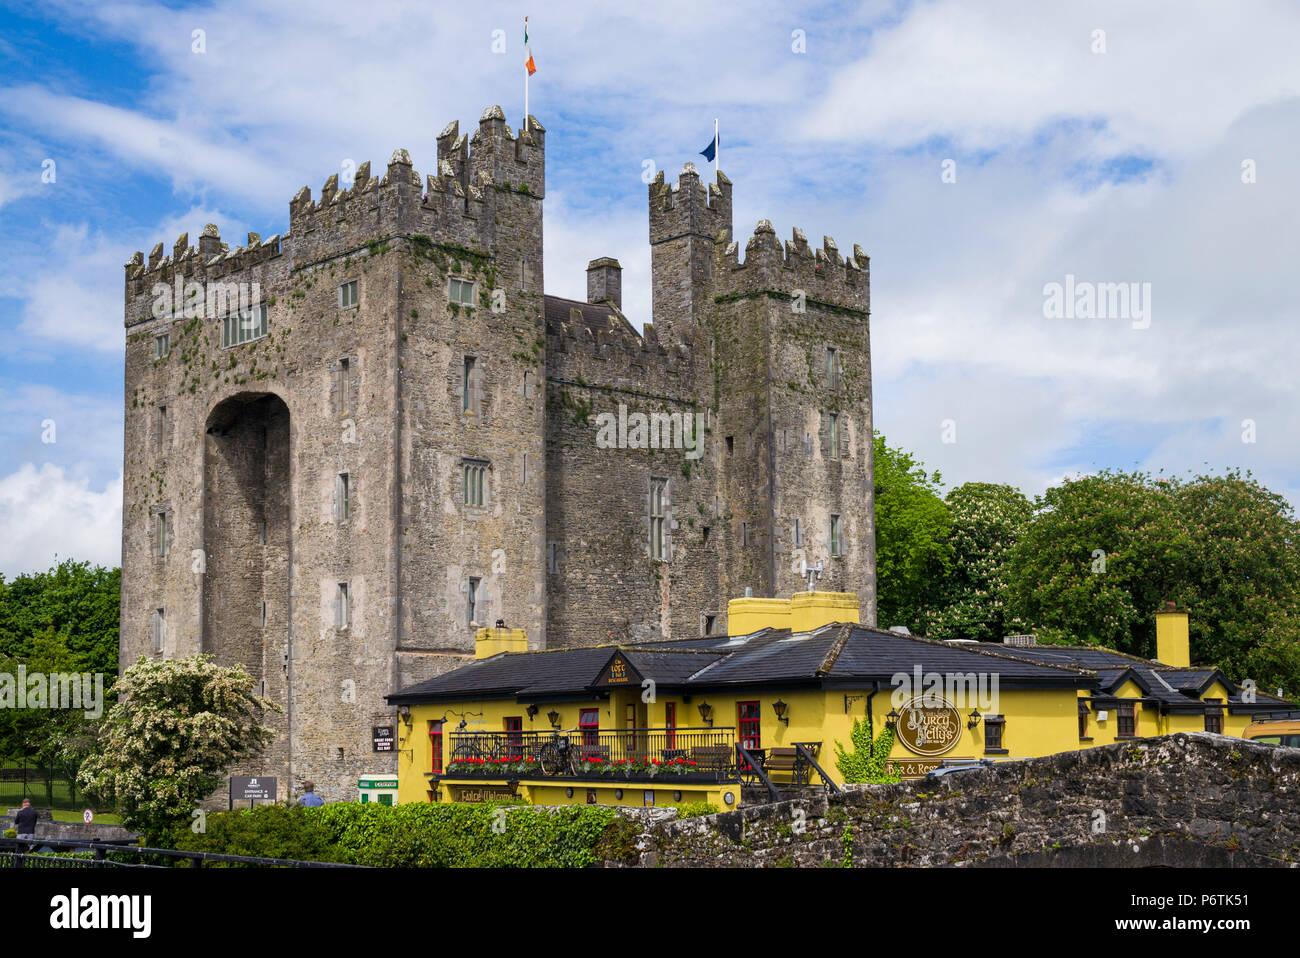 Ireland, County Clare, Bunratty, Bunratty Castle, 13th century - Stock Image